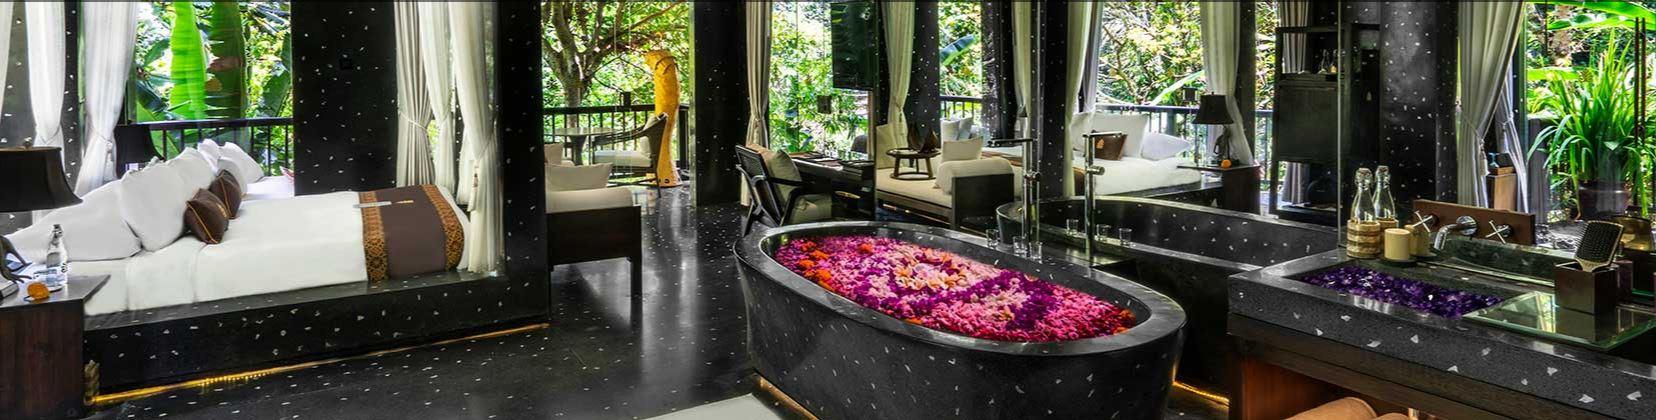 Hanging Gardens Bali suite spa dentination.JPG